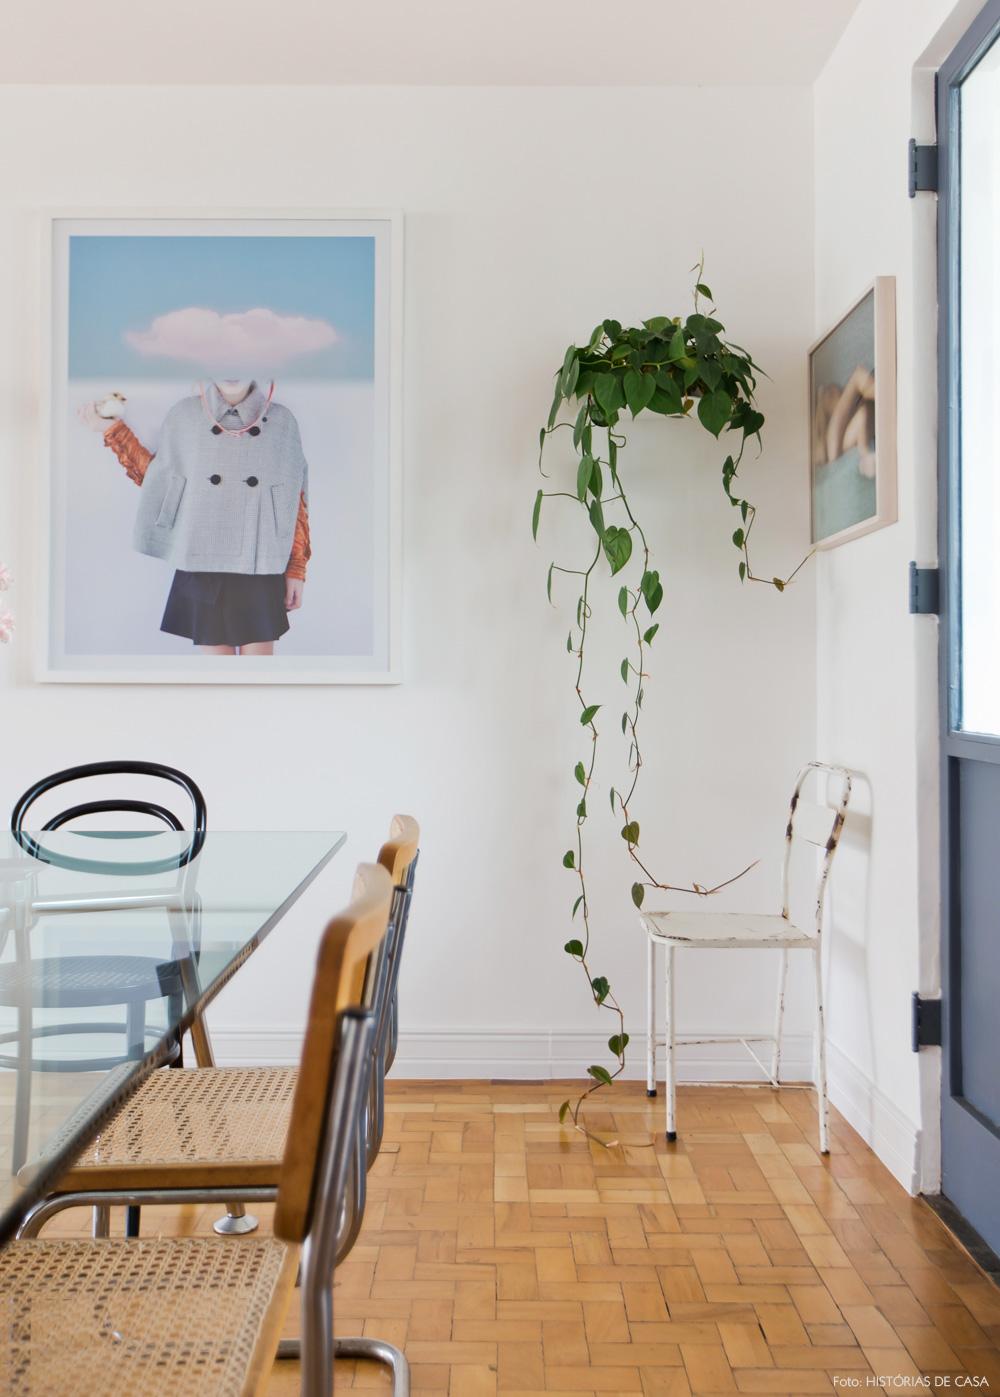 19-decoracao-sala-jantar-quadros-plantas-mesa-vidro-poltrona-ferro